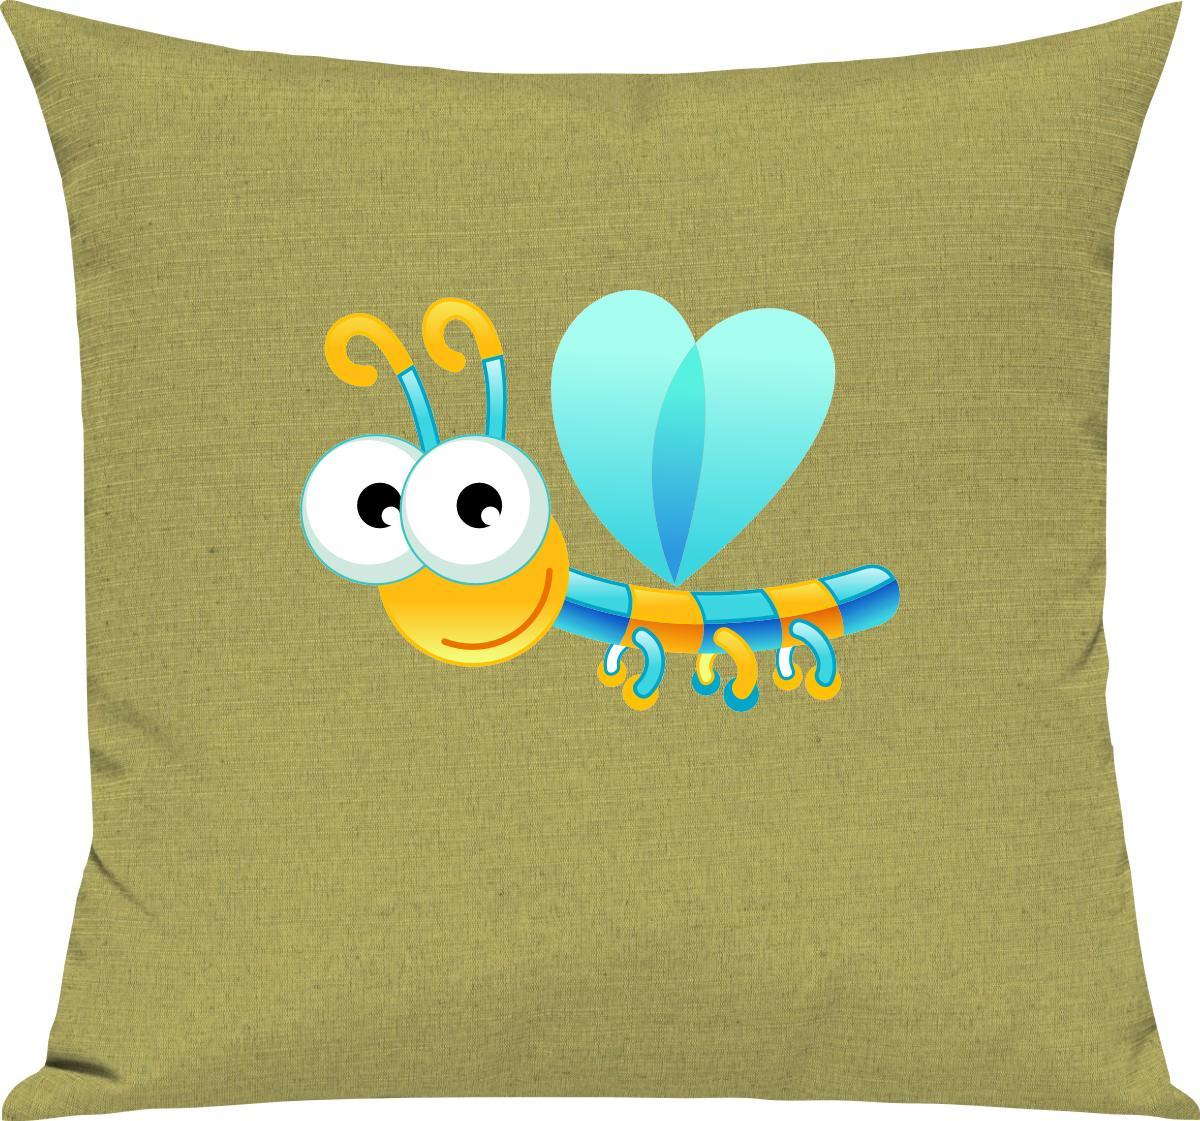 Indexbild 9 - Kinder Kissen, Libelle Insekt Tiere Tier Natur, Kuschelkissen Couch Deko,